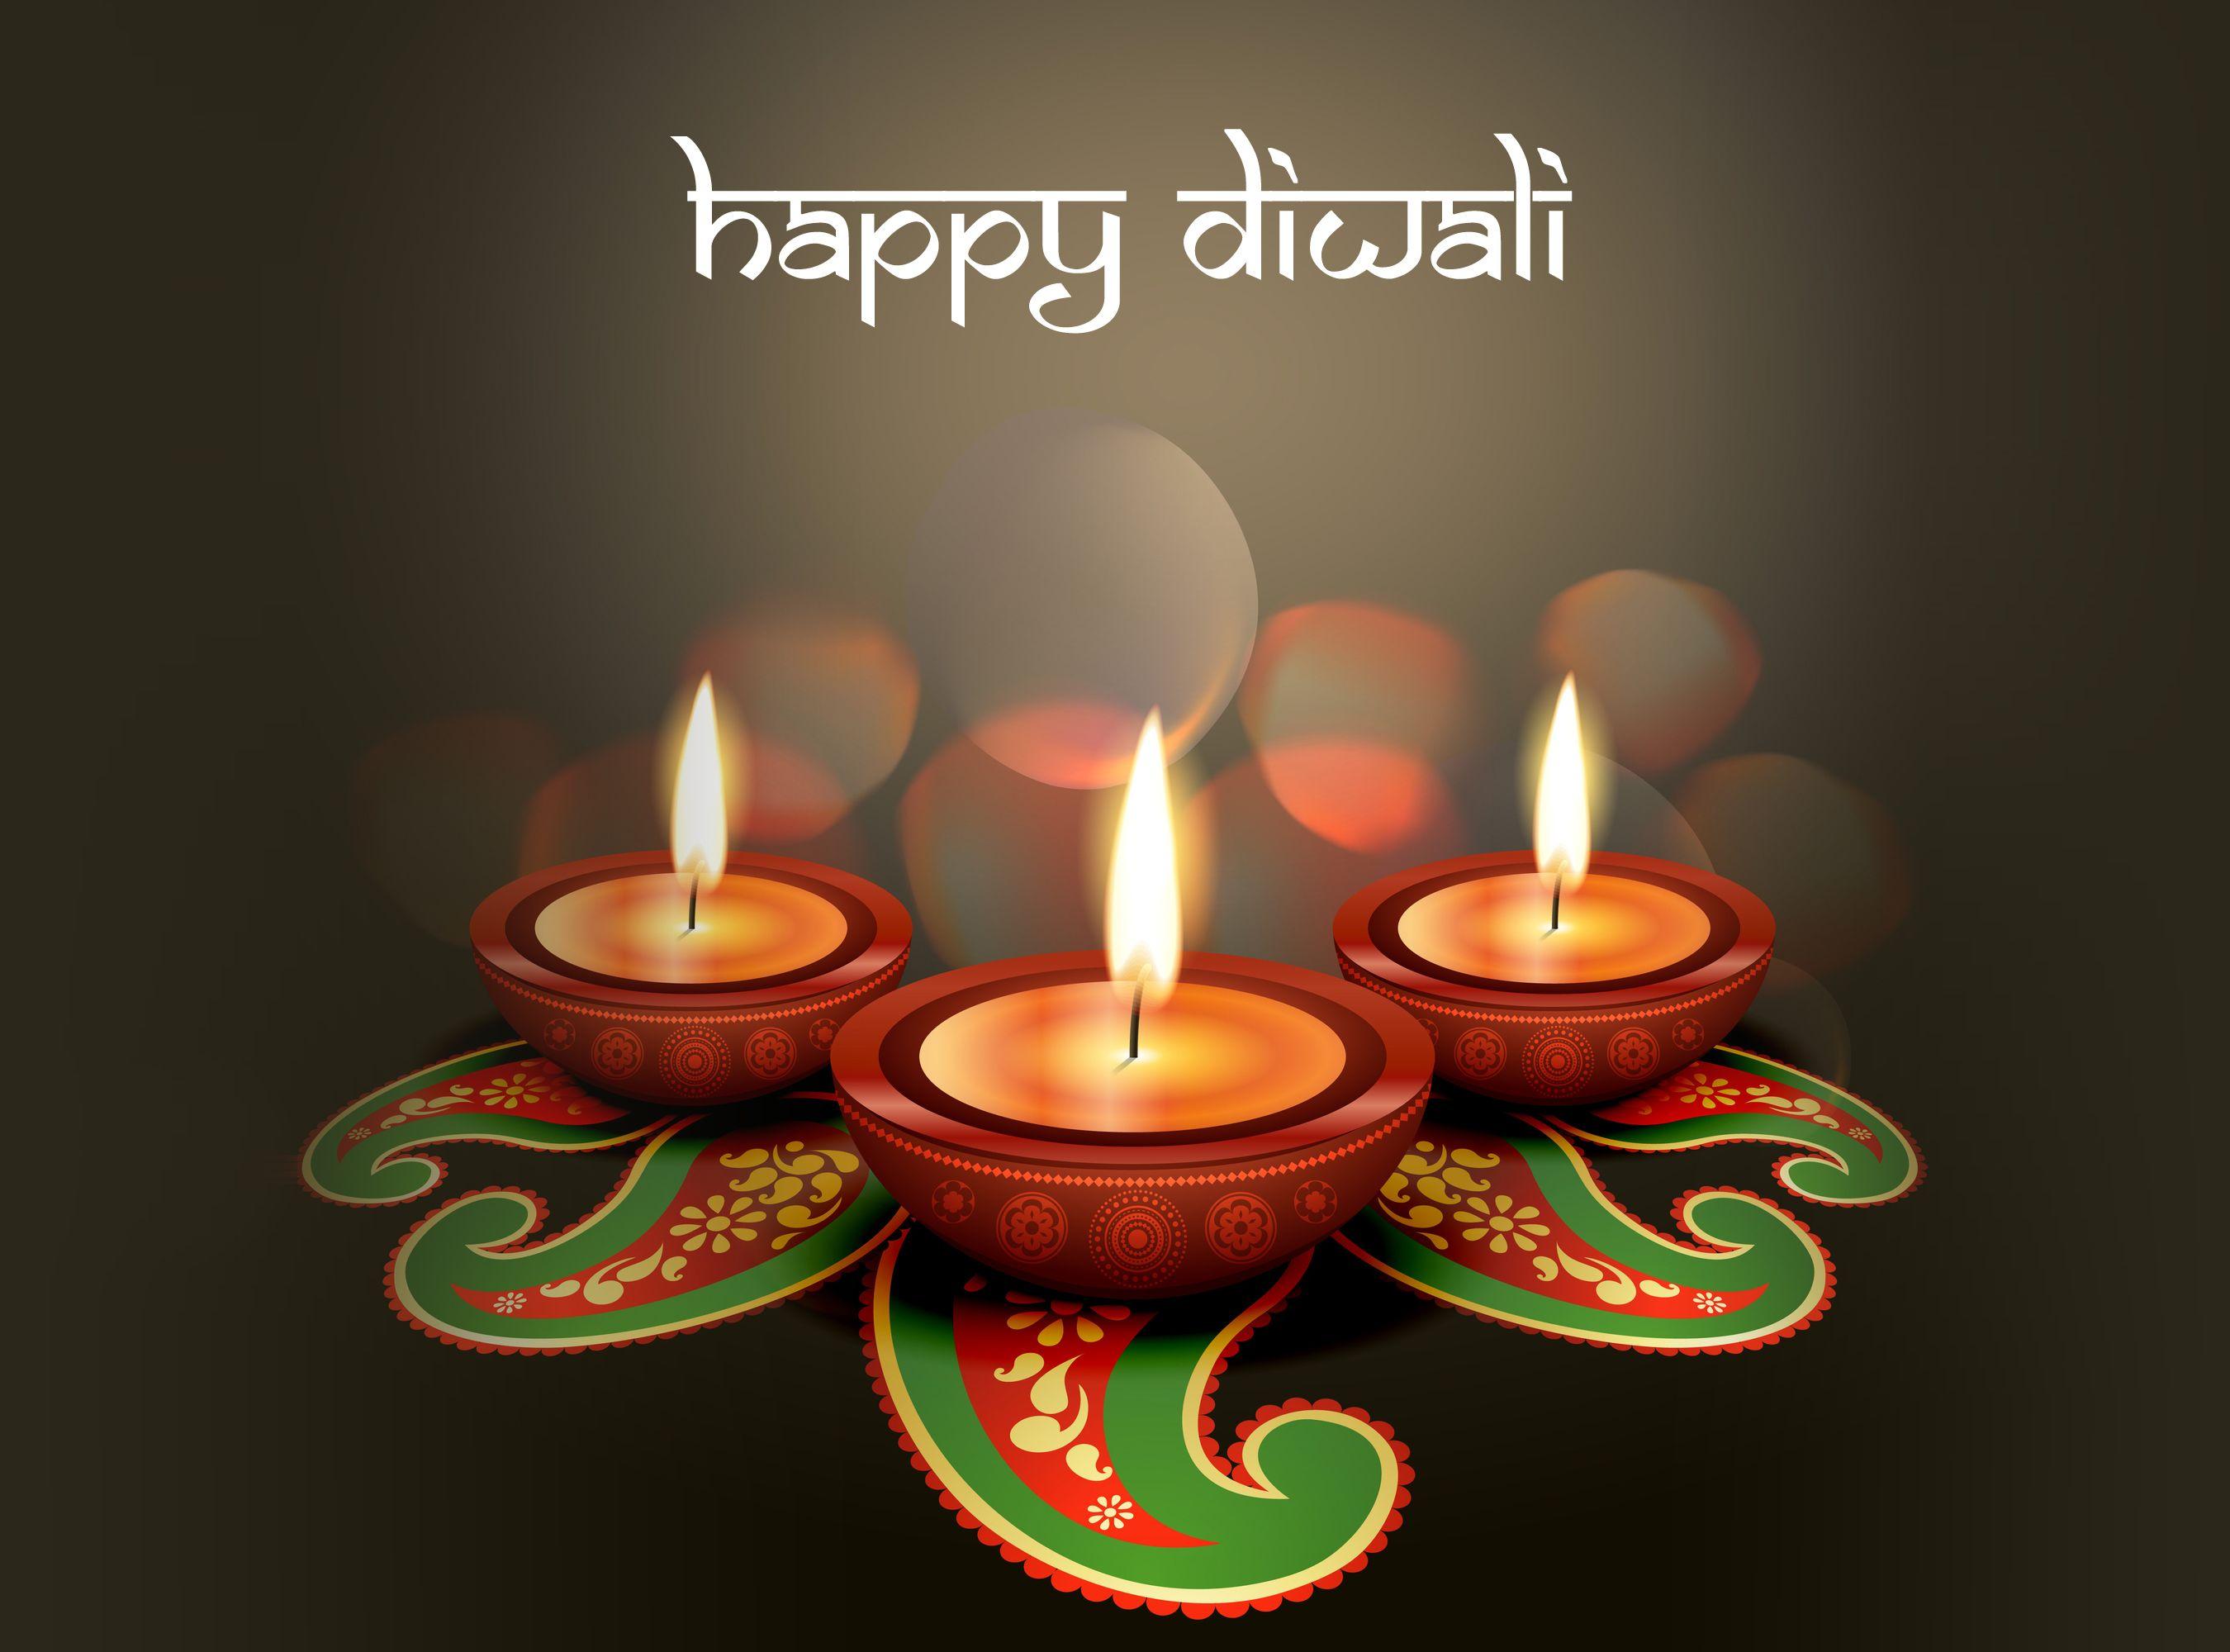 indian festival diwali | Happy Diwali HD Wallpapers Images ...